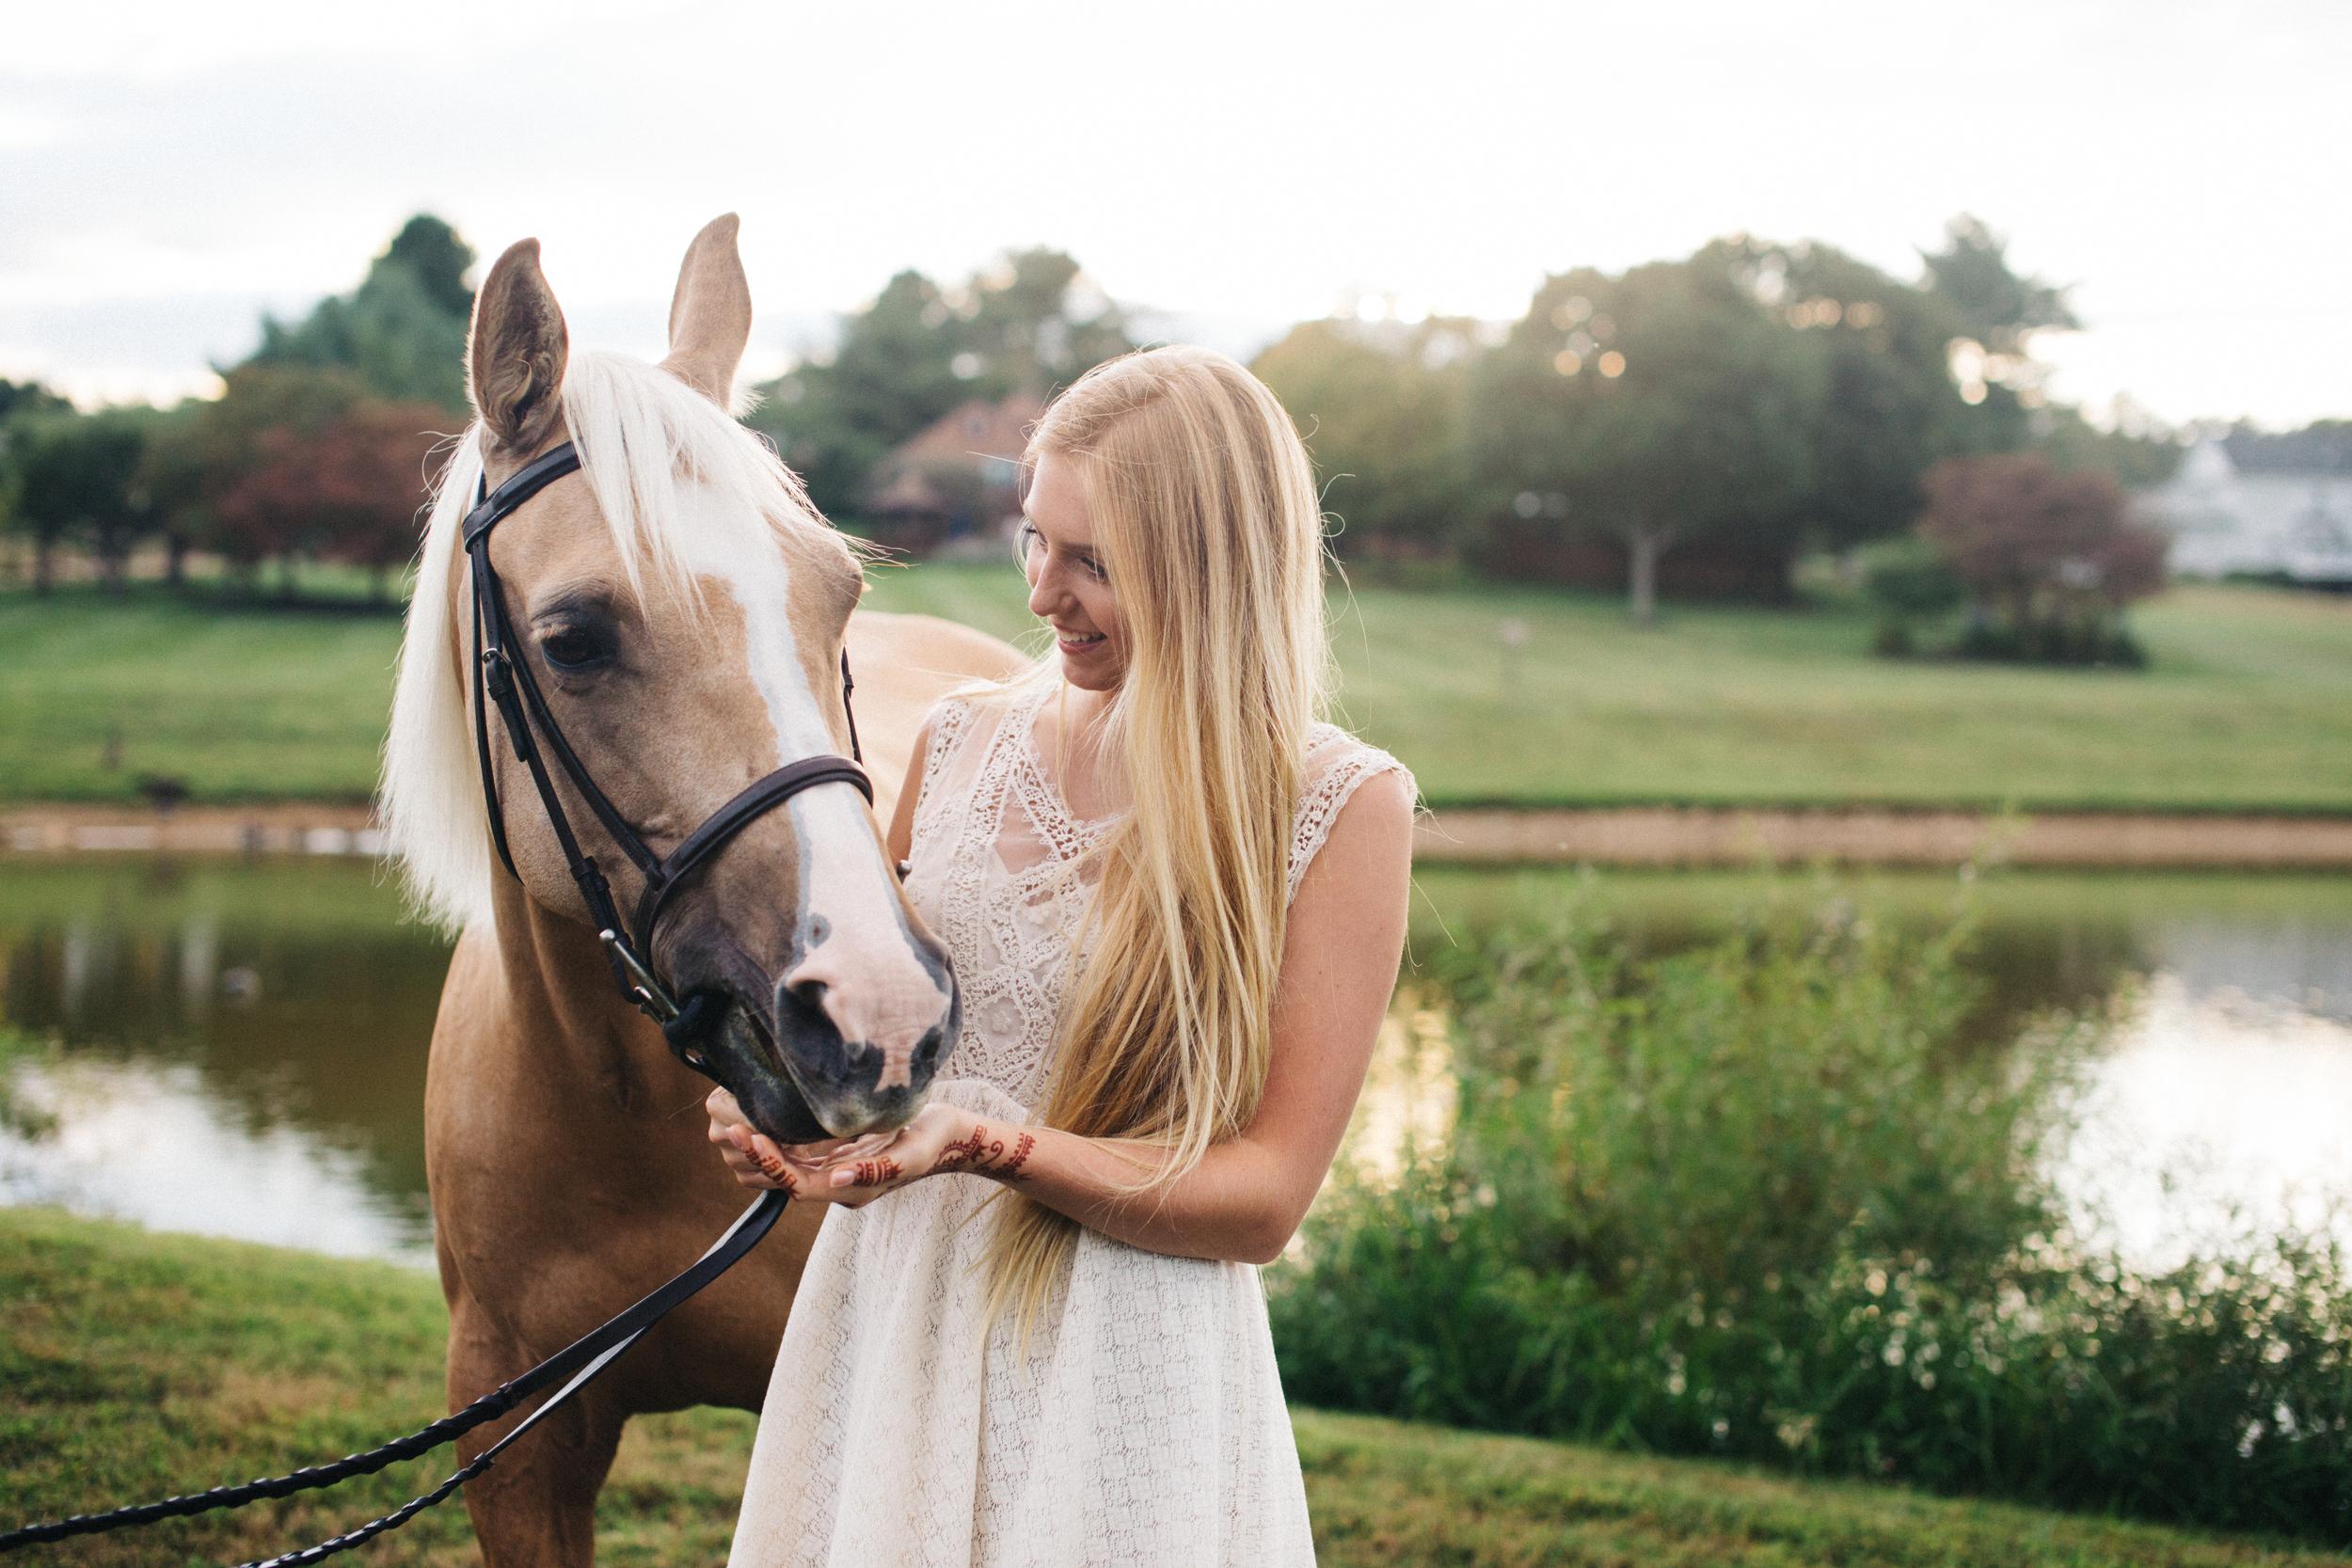 annapolis-maryland-senior-portrait-session-photographer-boho-horse-inspo-emma-jean-photography-11-photo.jpg